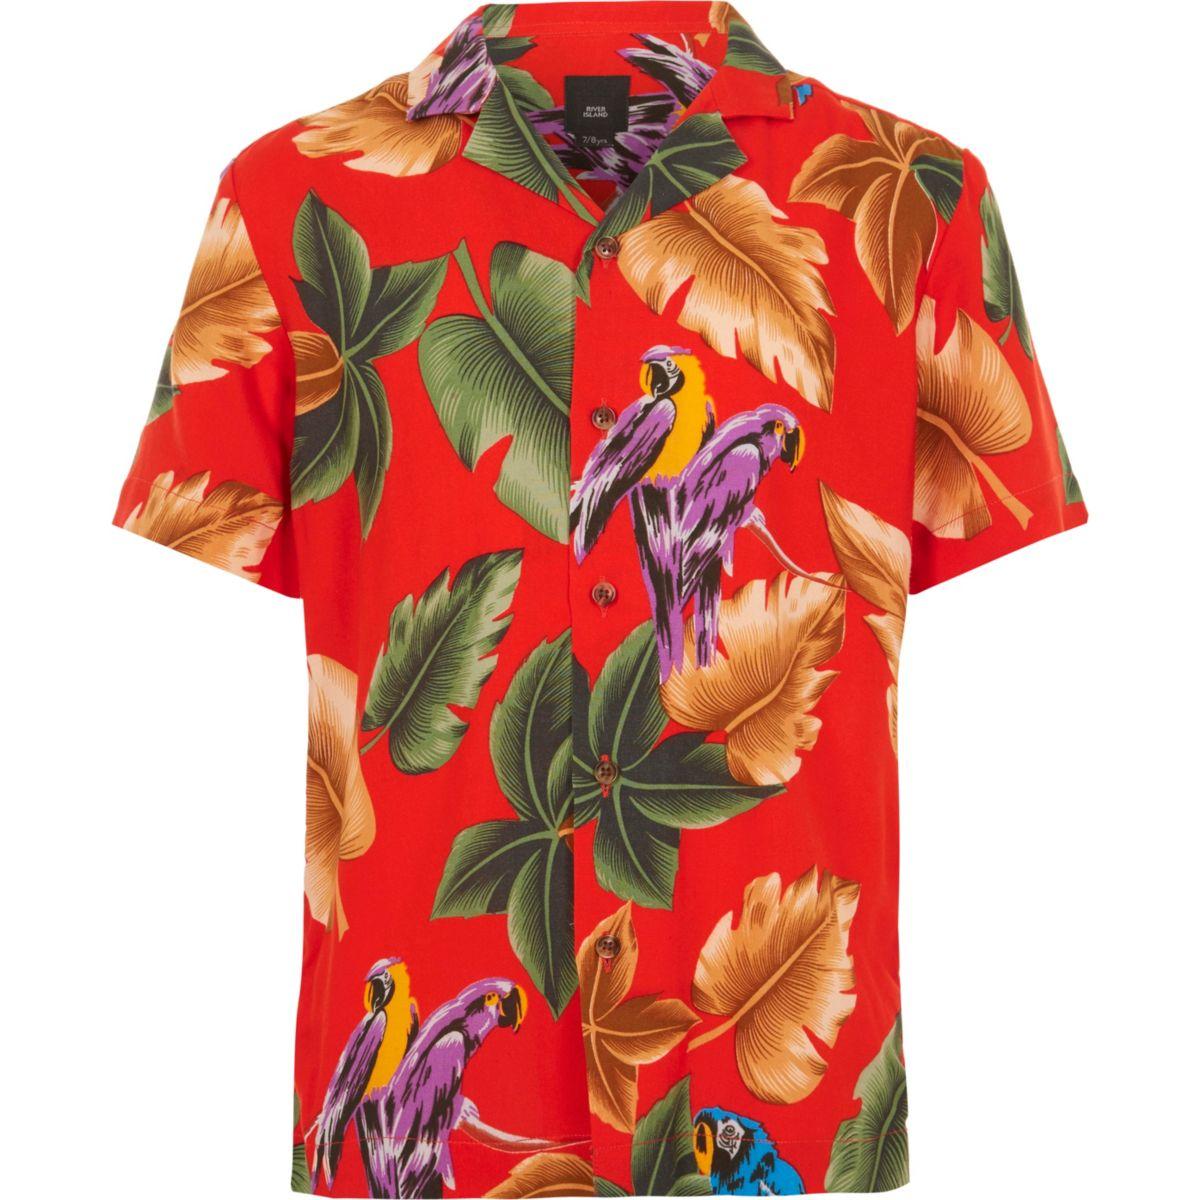 Boys red short sleeve parrot print shirt